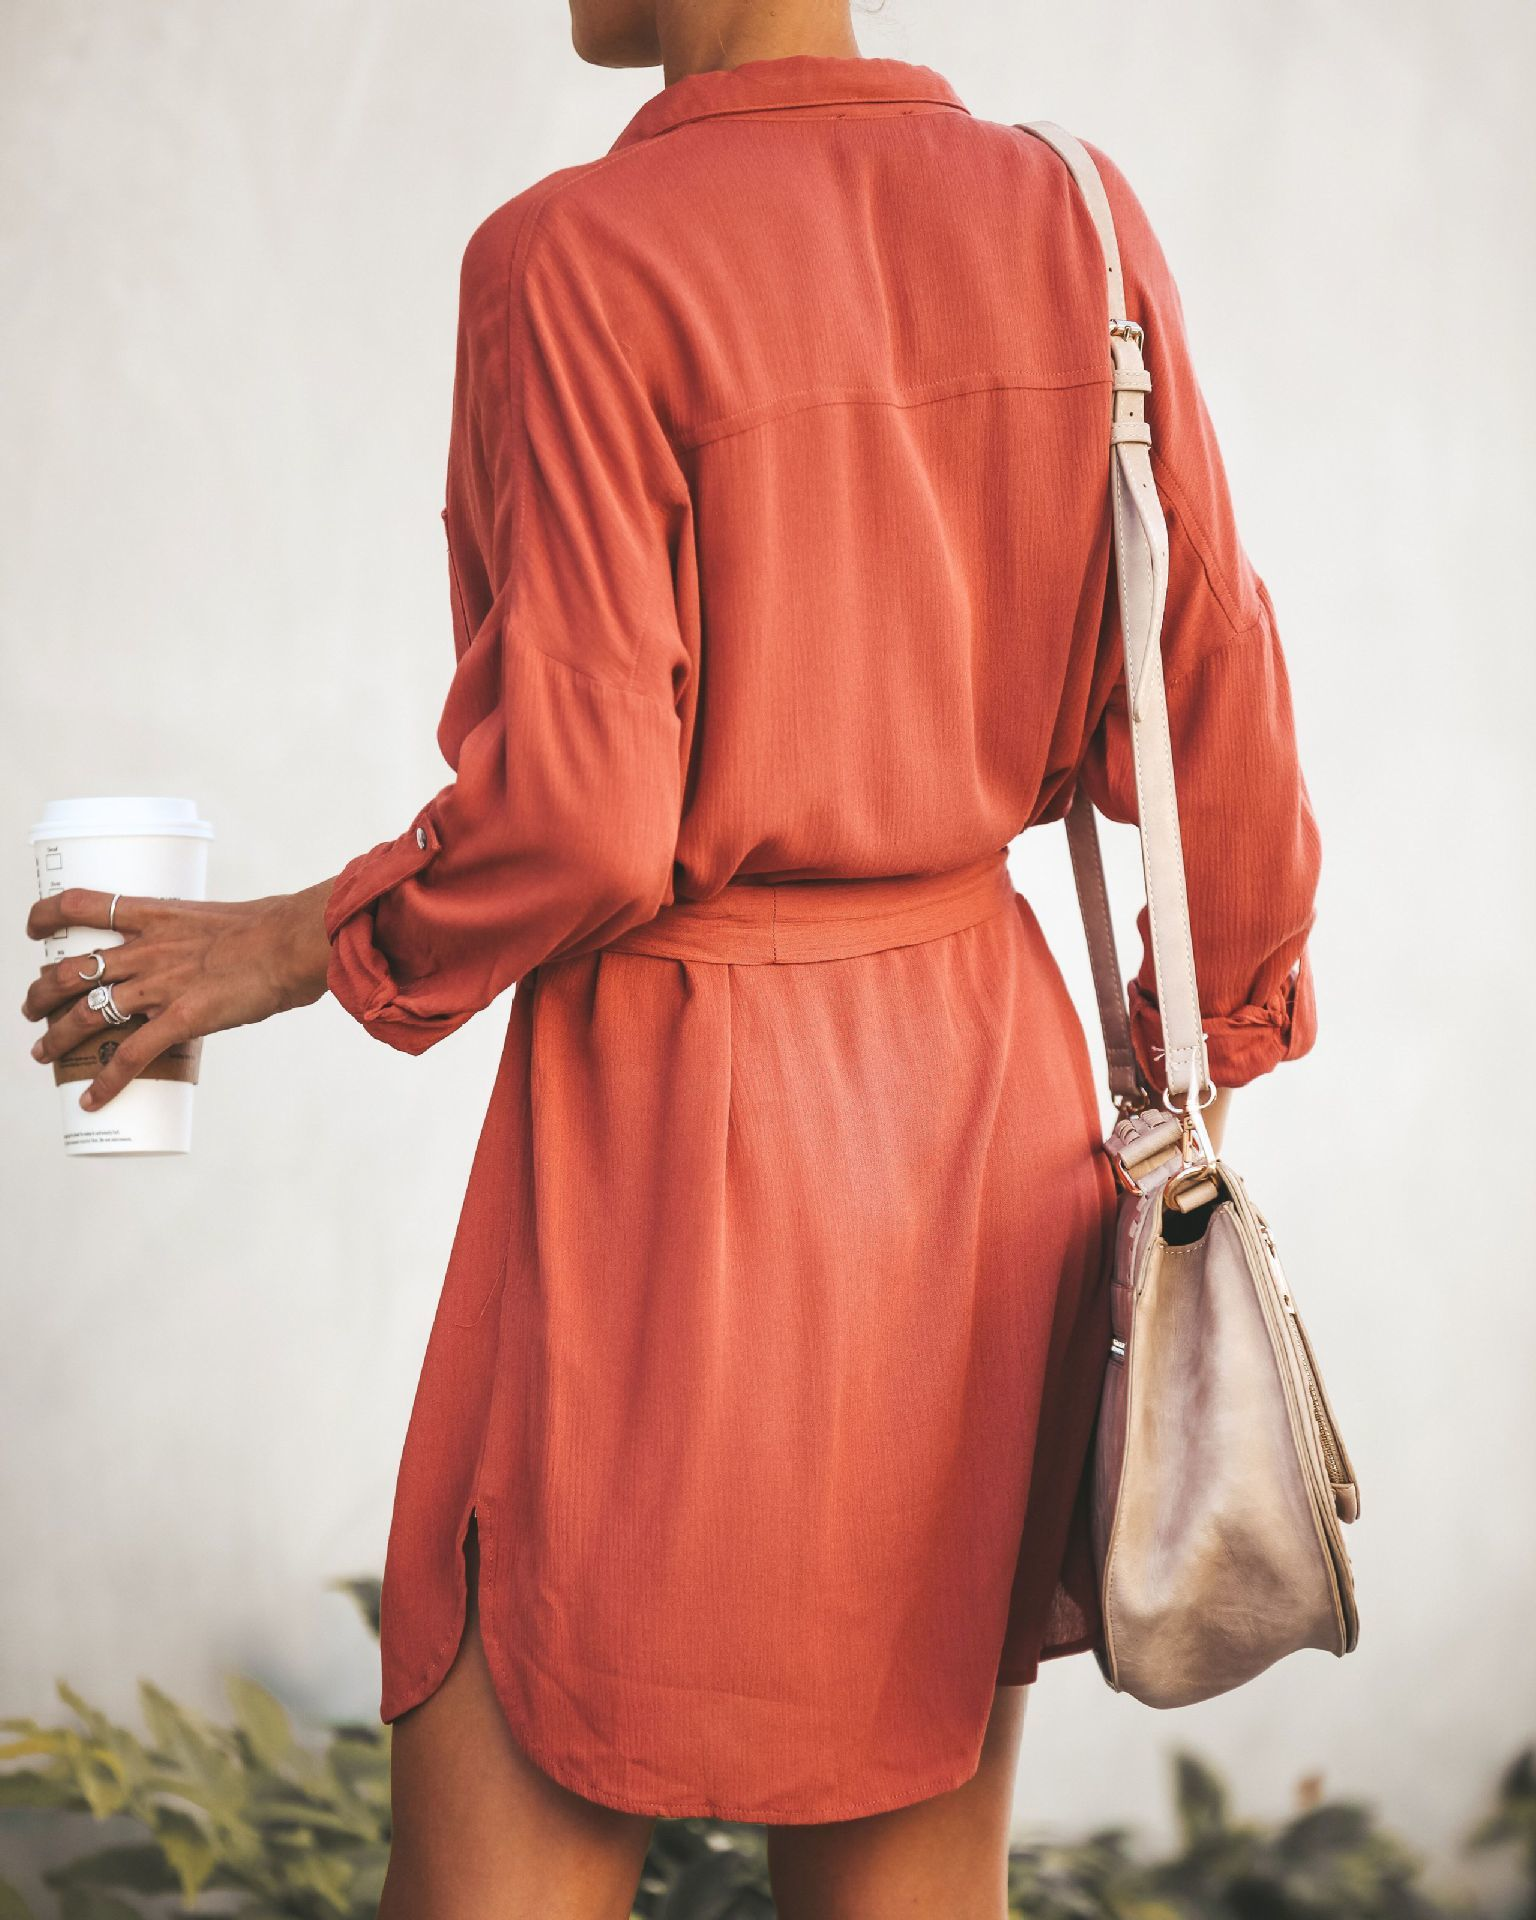 Botón para arriba vestido naranja nudo Hem camisa Vestido Mujer manga larga Oficina señoras vestidos de trabajo 2019 elegante mujeres Mini vestido